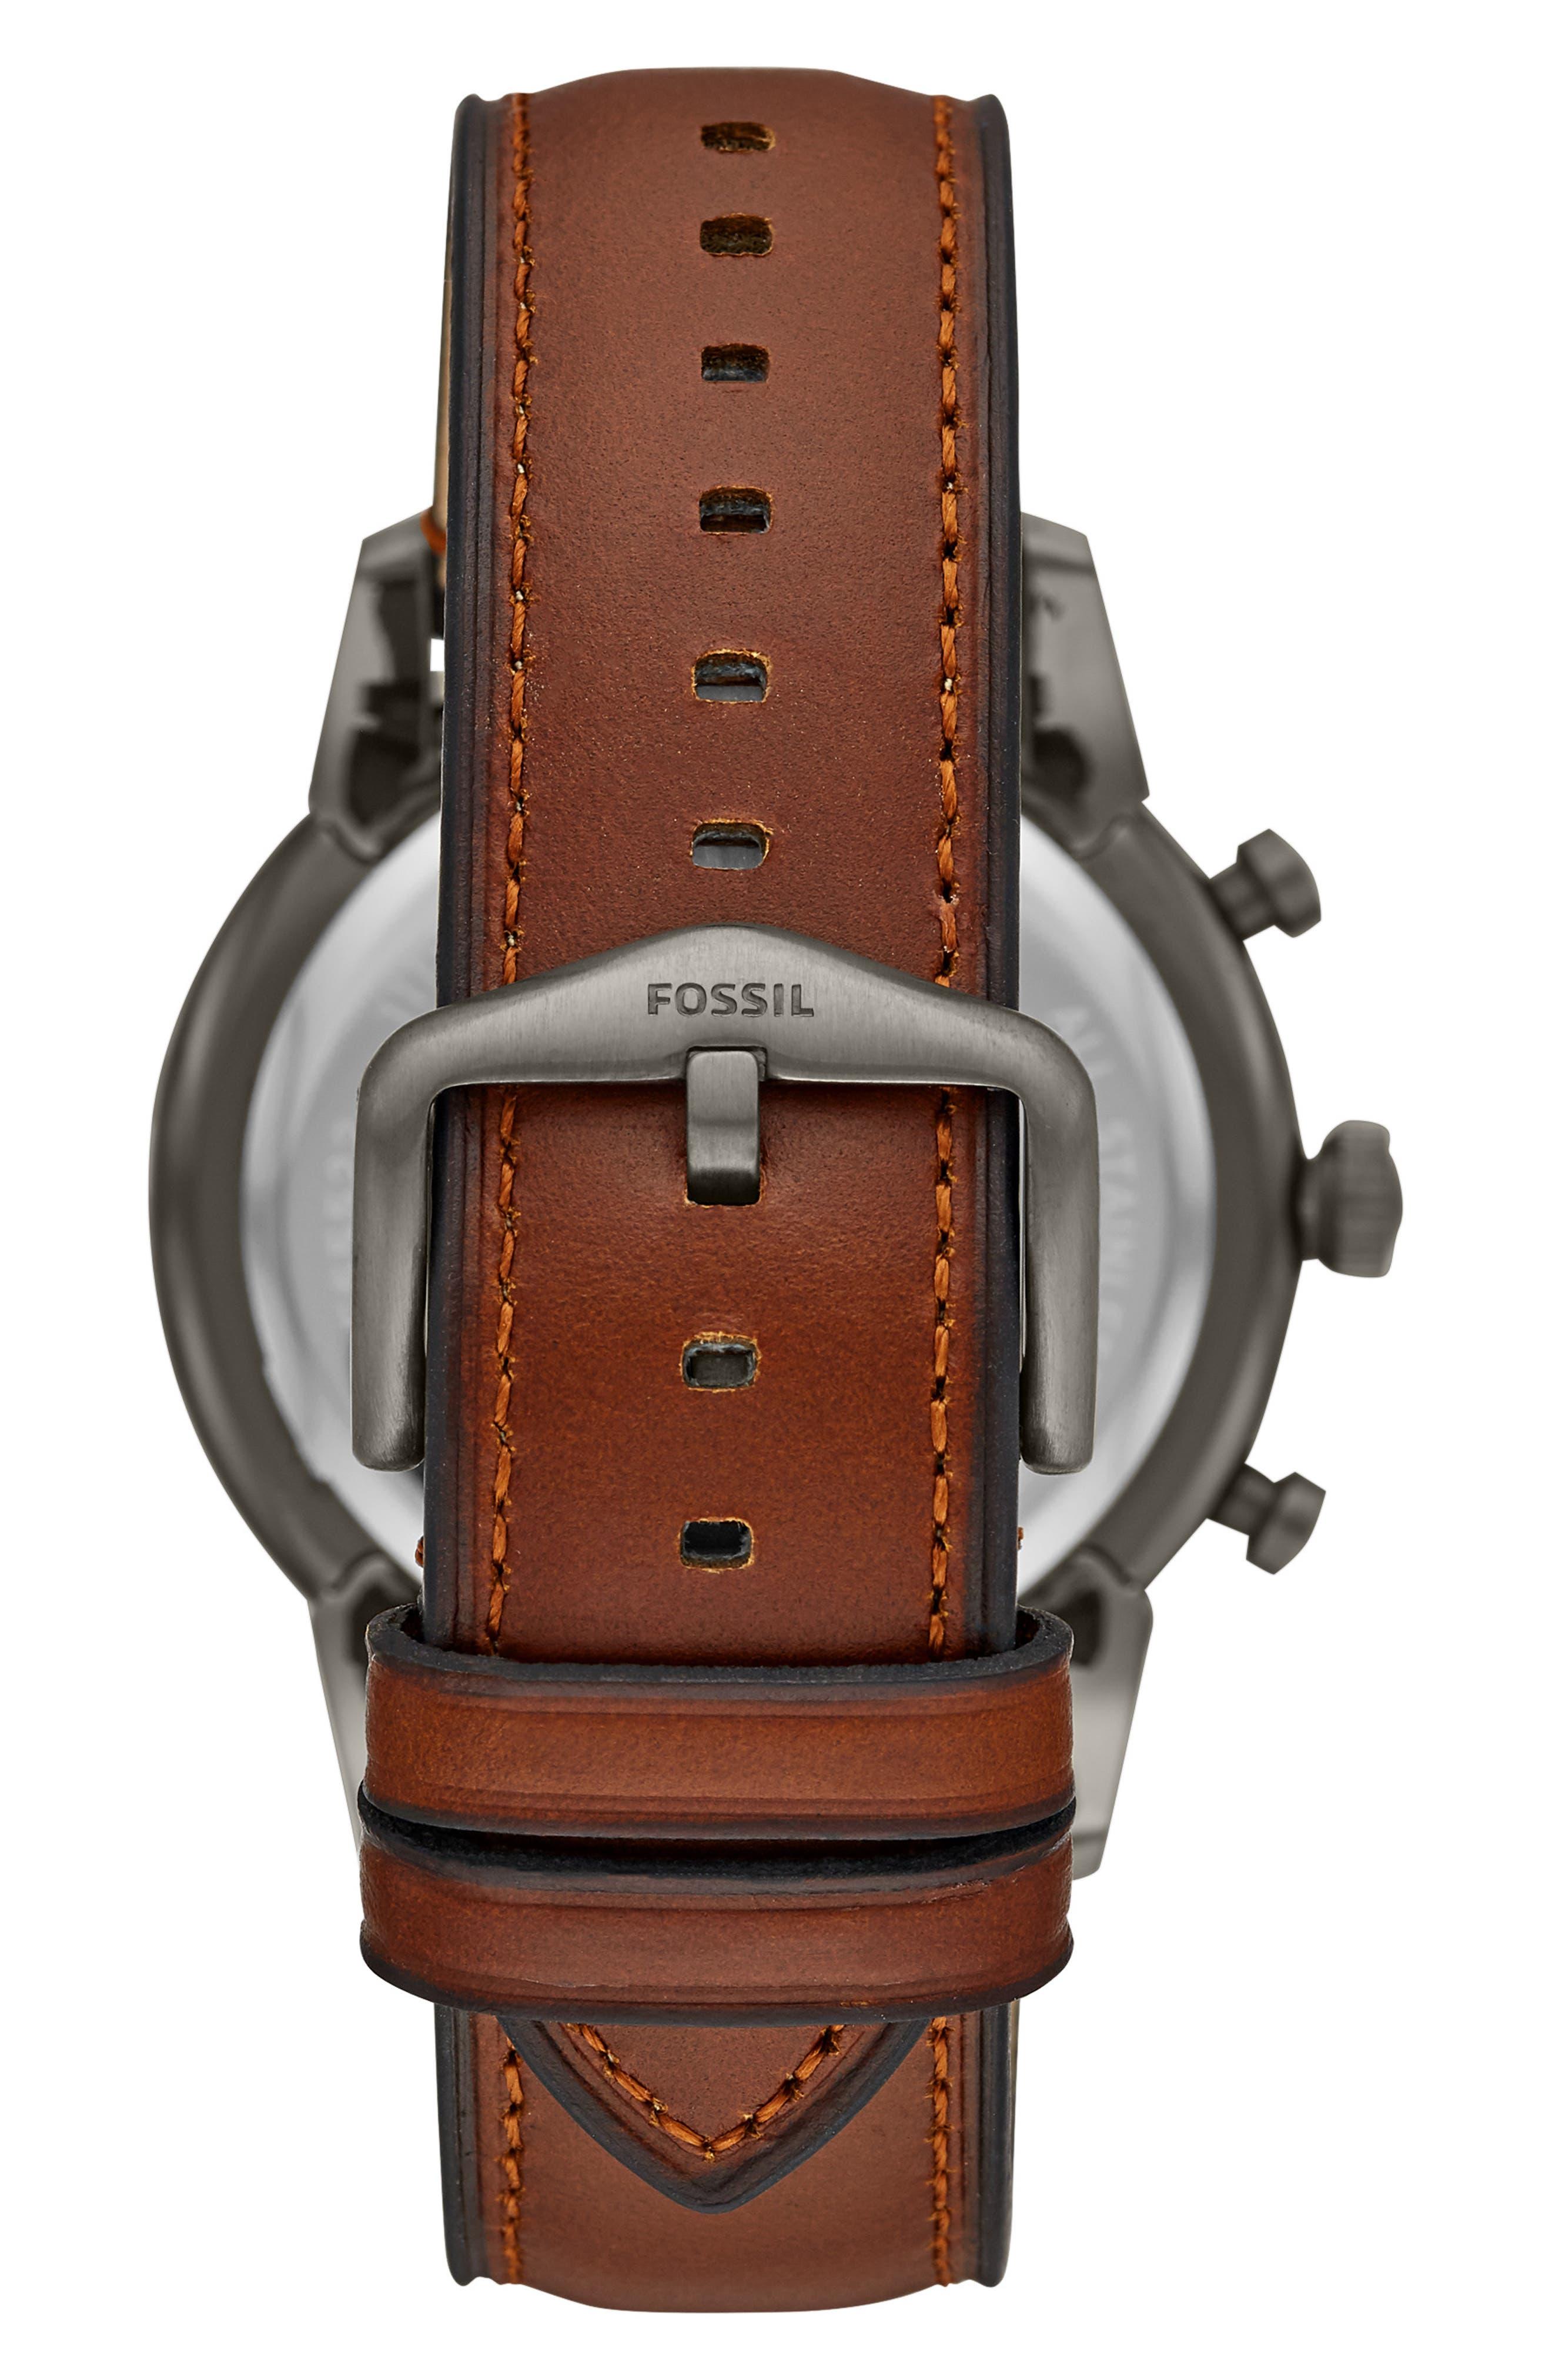 FOSSIL, Townsman Chronograph Leather Strap Watch, 44mm, Alternate thumbnail 2, color, BROWN/ GREY/ SMOKE